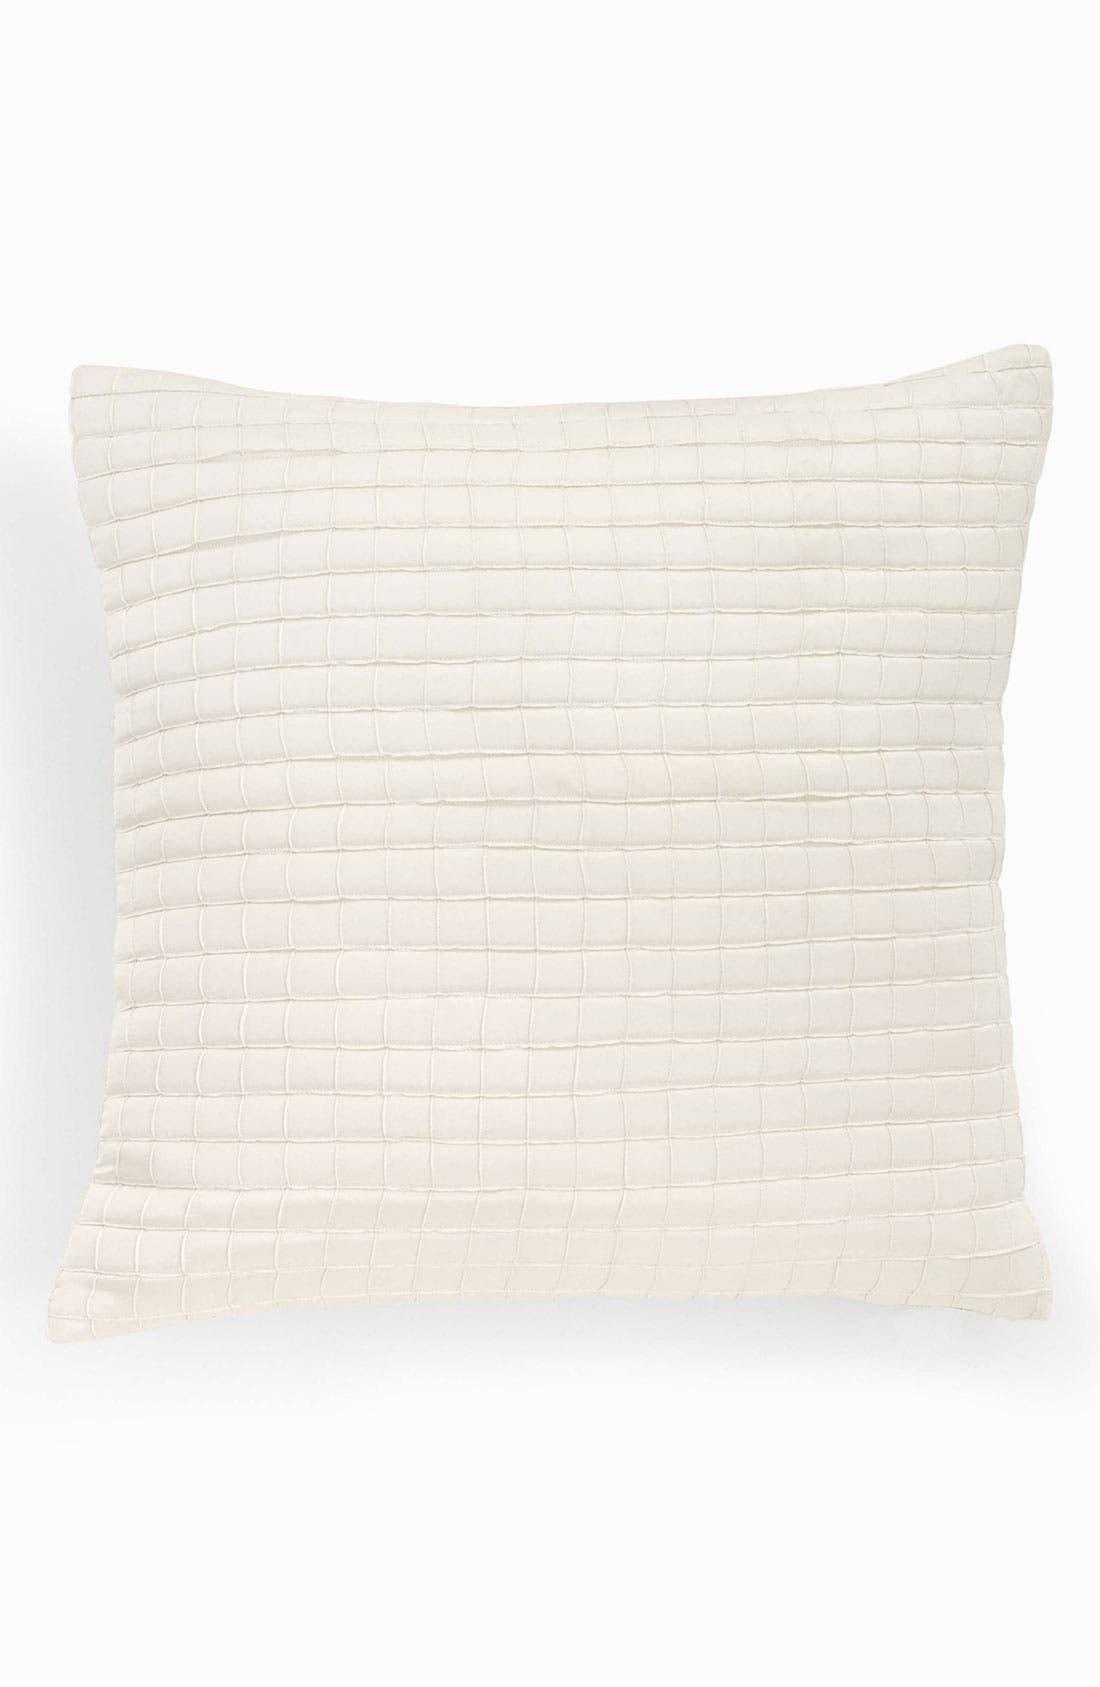 Alternate Image 1 Selected - Donna Karan Tufted Silk Pillow (Online Only)